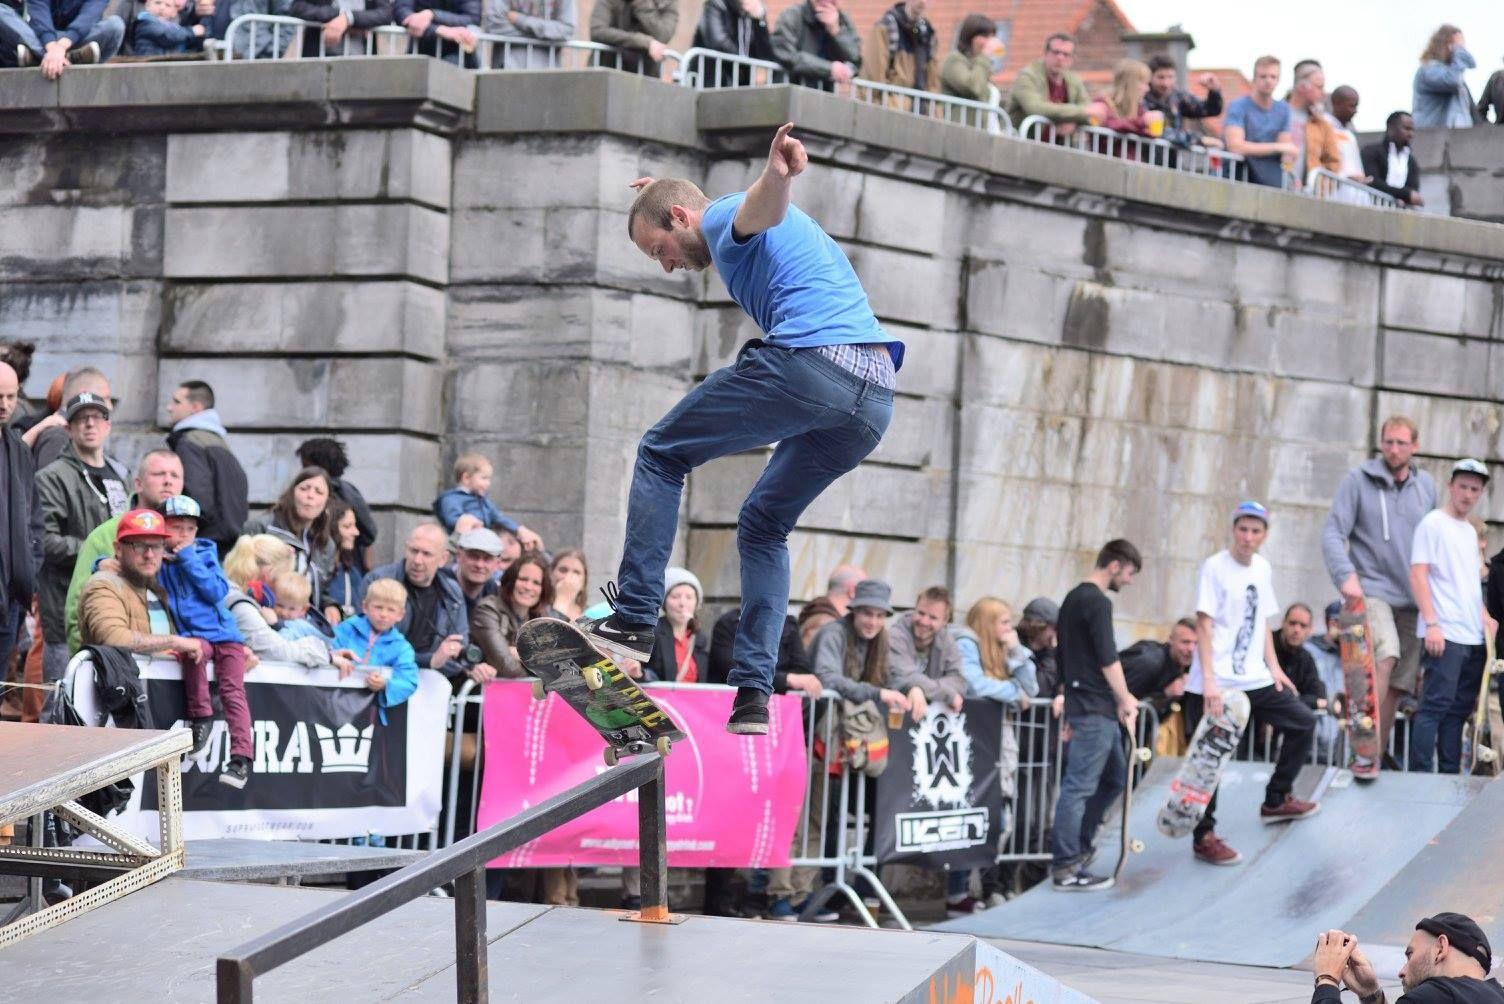 SKATE & ROCK Fest Tournai BELGIUM 22/05/2016 Sponsored by Ikōn Skateboarding ® EST 2015  WE SERVE YOUR SUBCULTURE  Site: www.ikonskateboarding.com #skateboarding #streetwear #skateshop #skatewear #skateboard #skate #ikonskateboarding